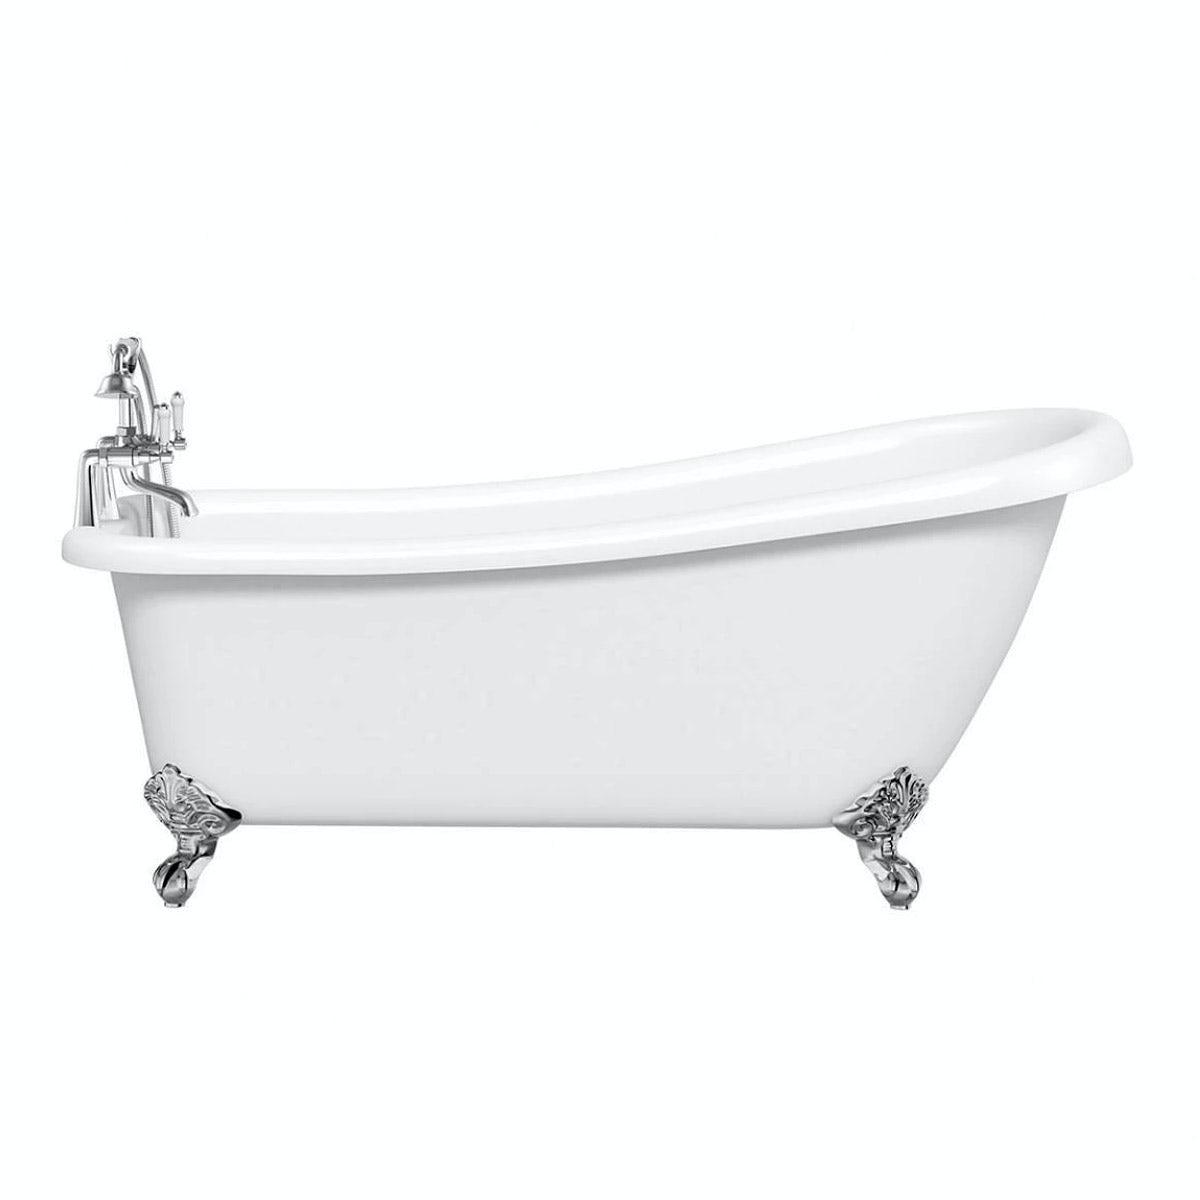 The Bath Co. Winchester slipper bath with ball feet 1680 x 780